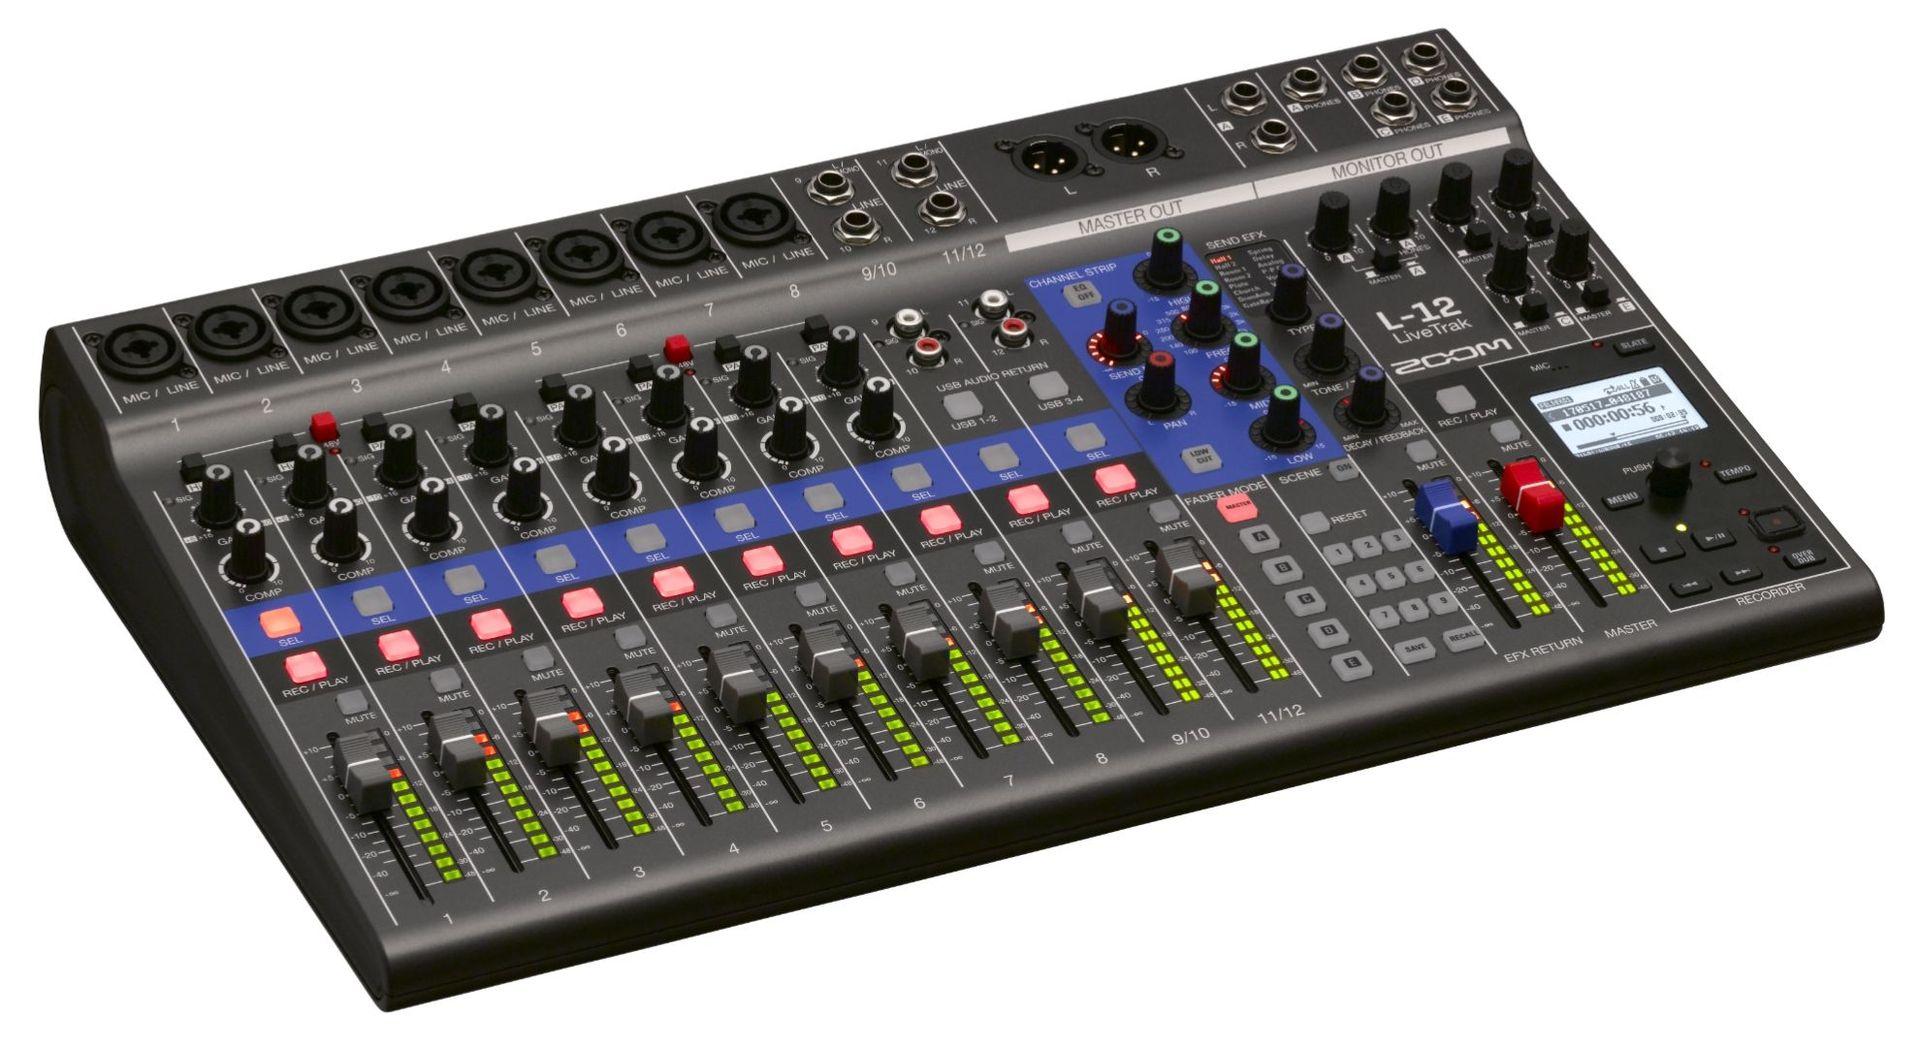 Zoom Livetrak L-12 Digitalmixer, Mehrspur-Recorder und Audiointerface